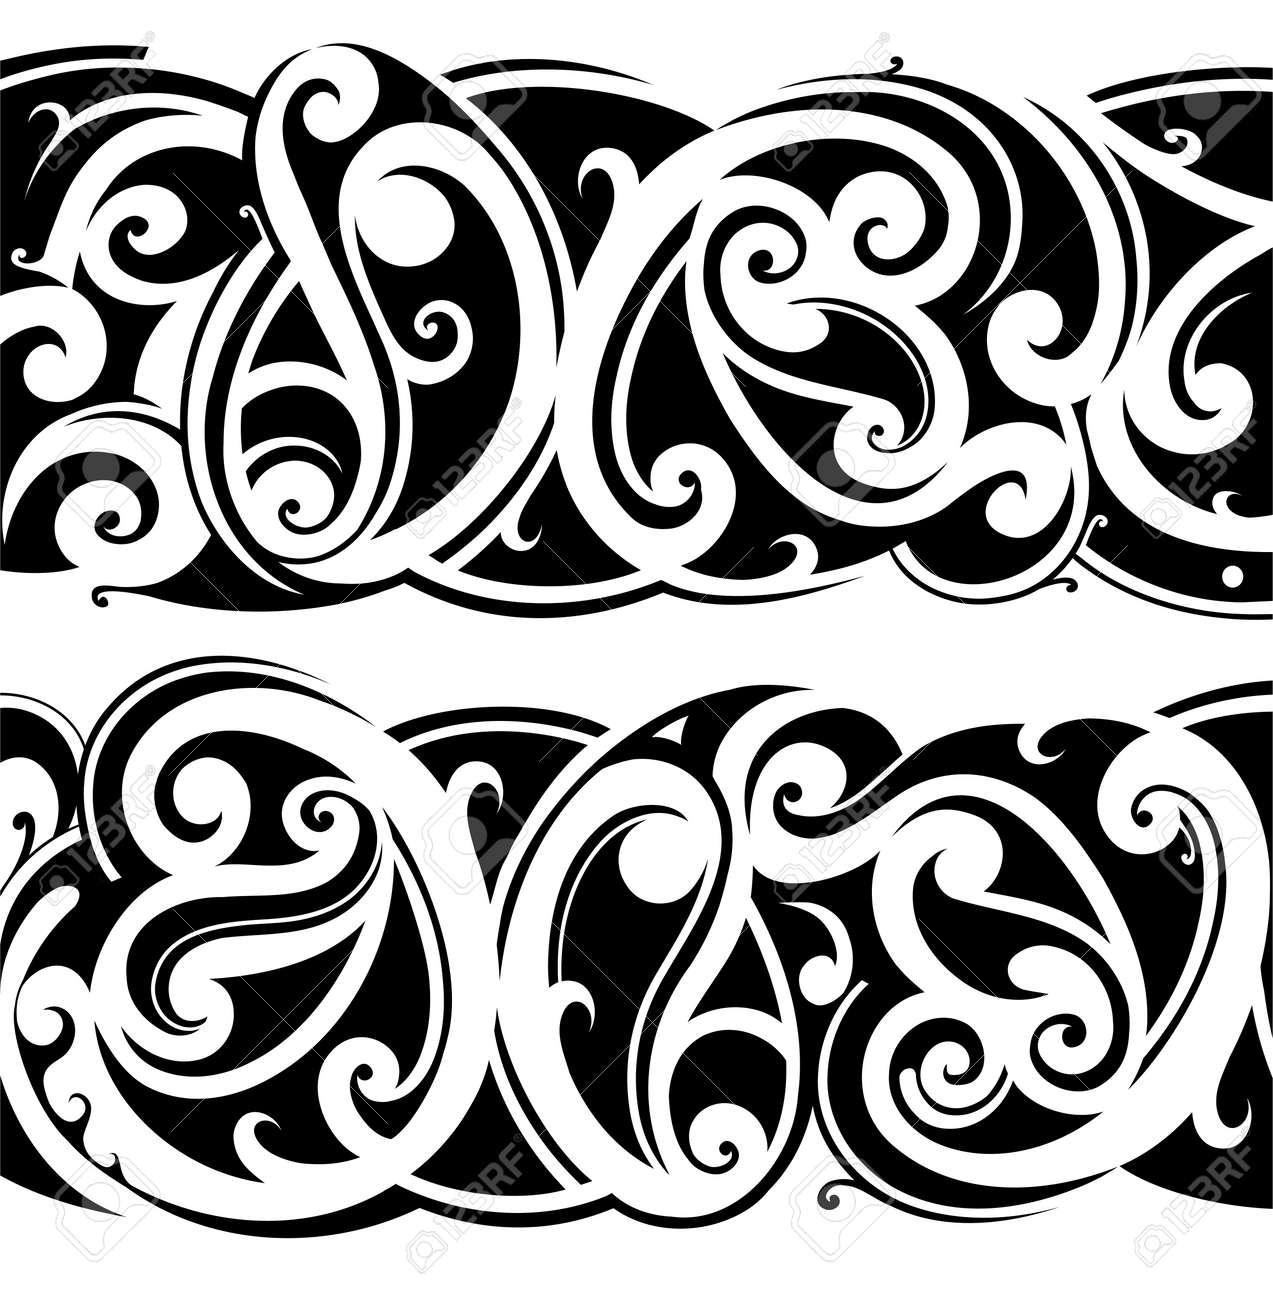 Maori ethnic tattoo fusion with celtic style - 54539984